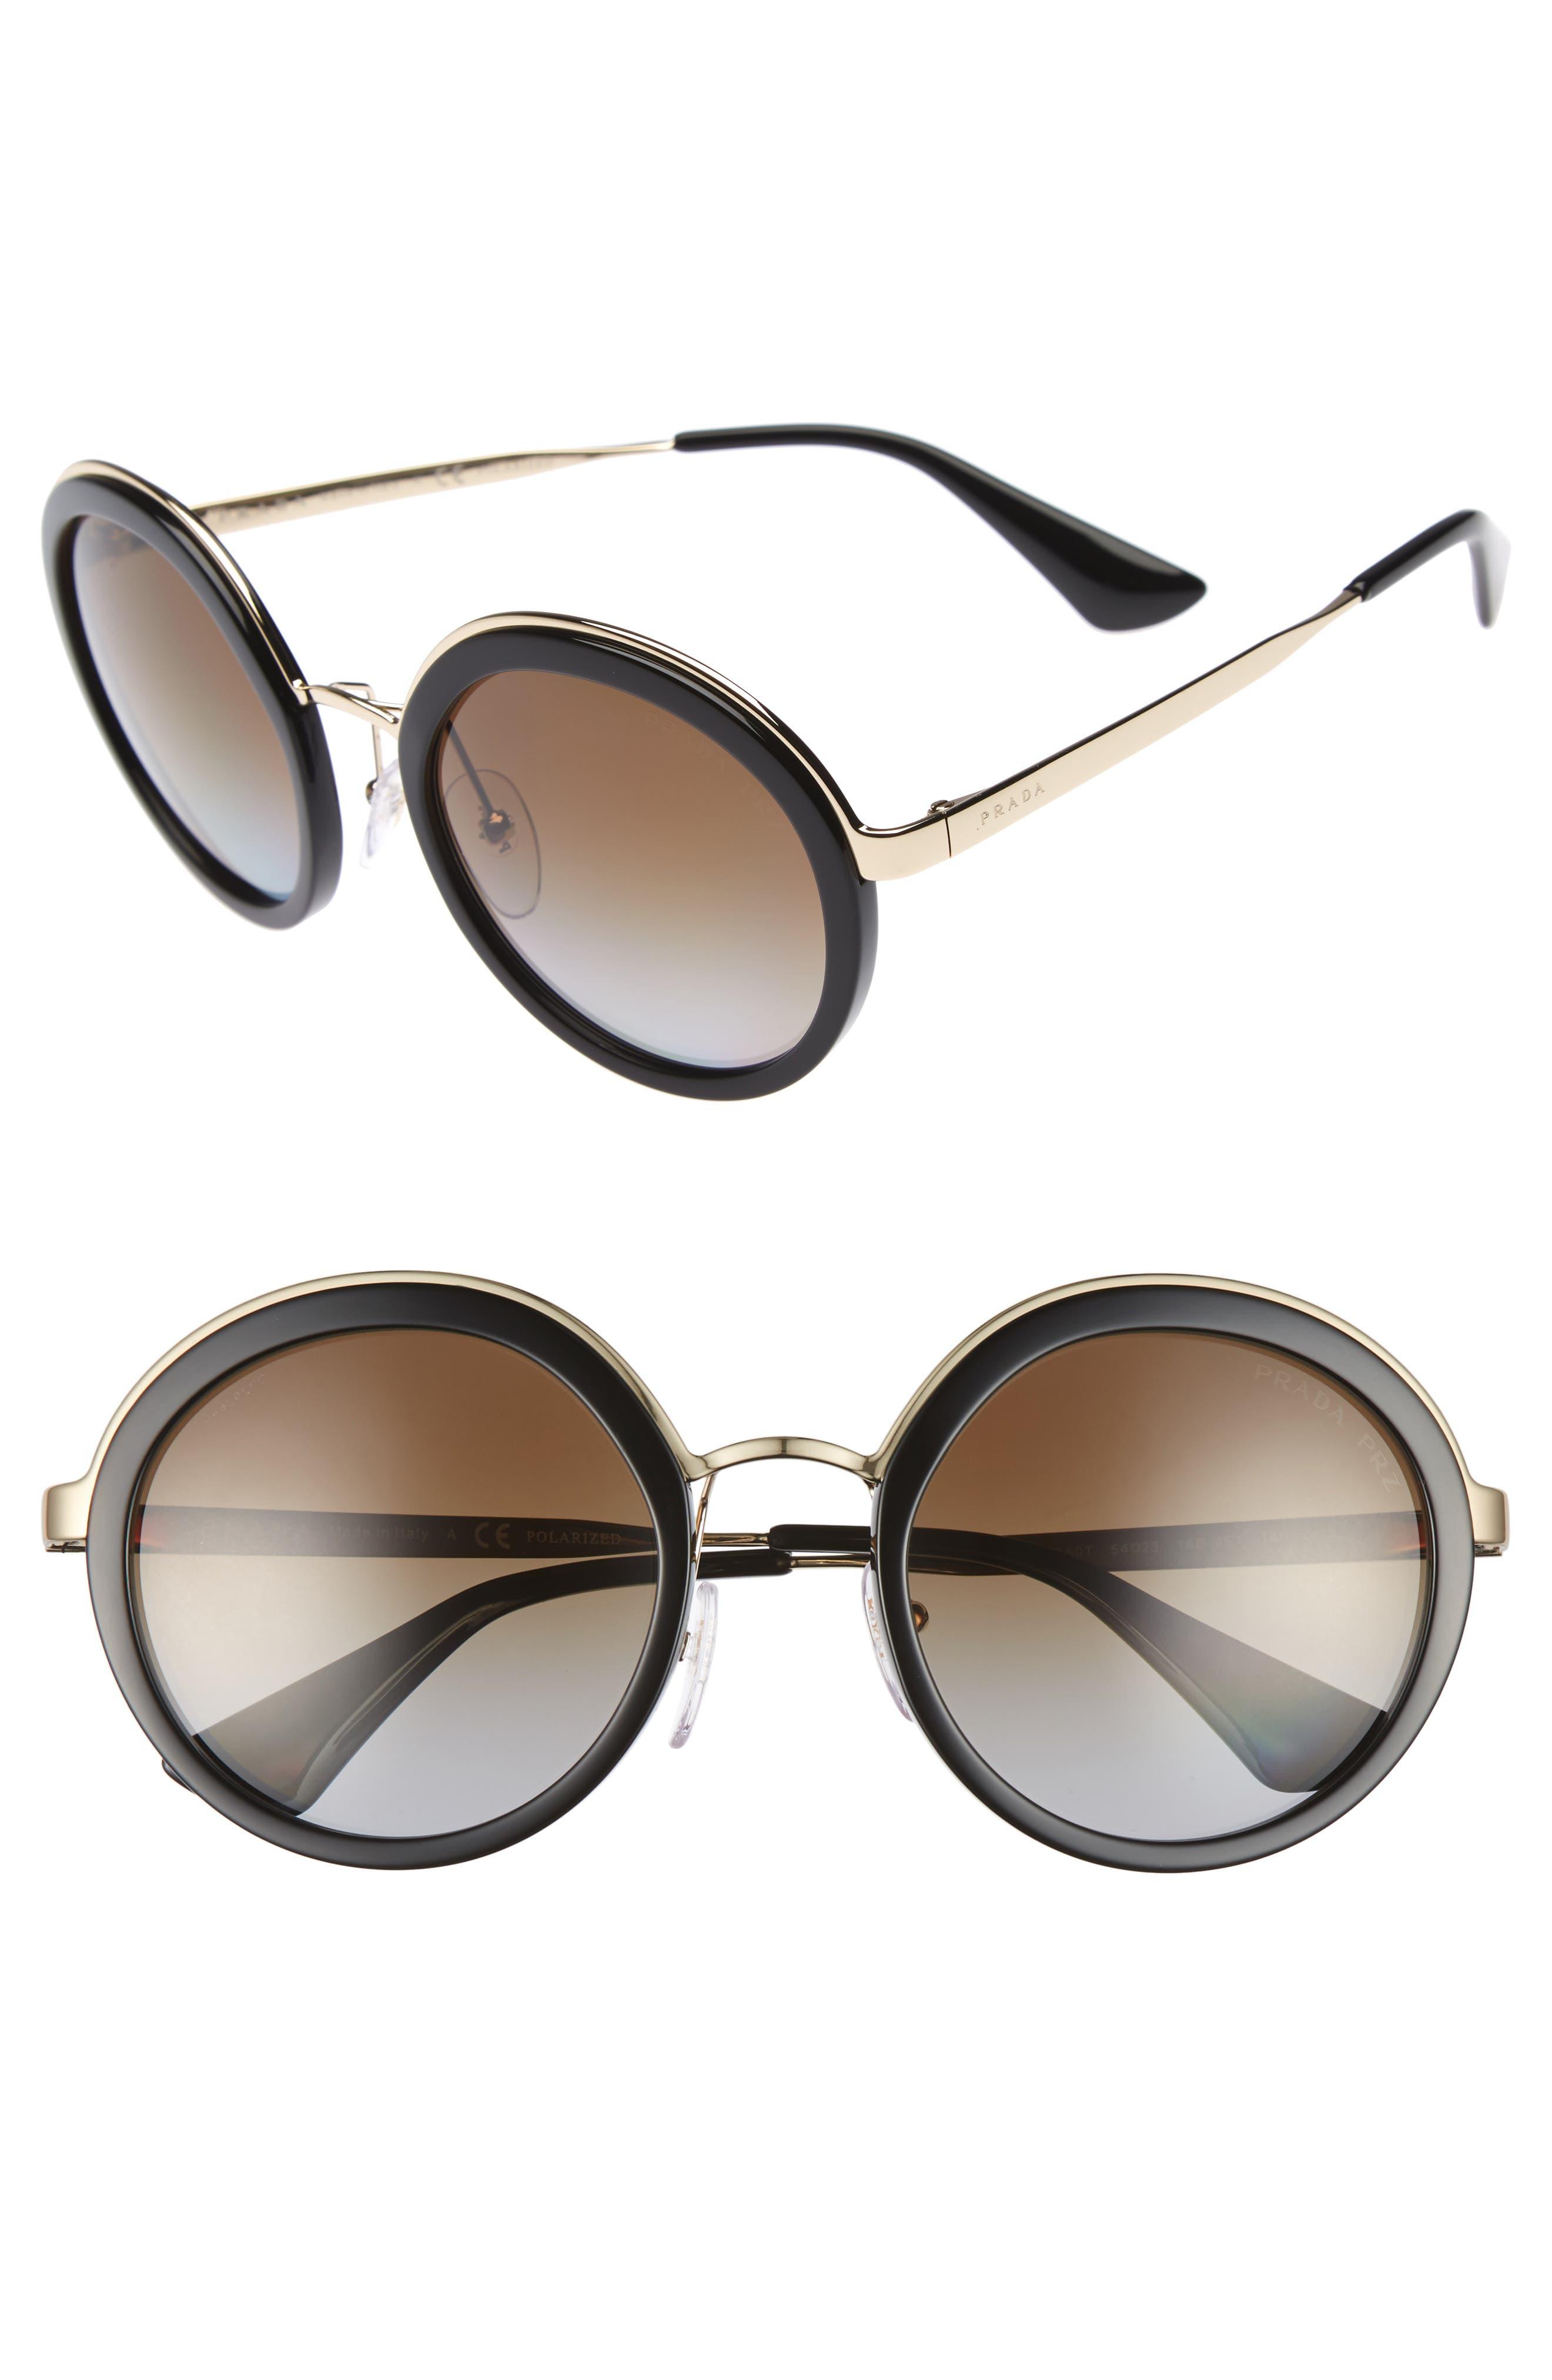 54mm Polarized Round Sunglasses,                             Main thumbnail 1, color,                             001